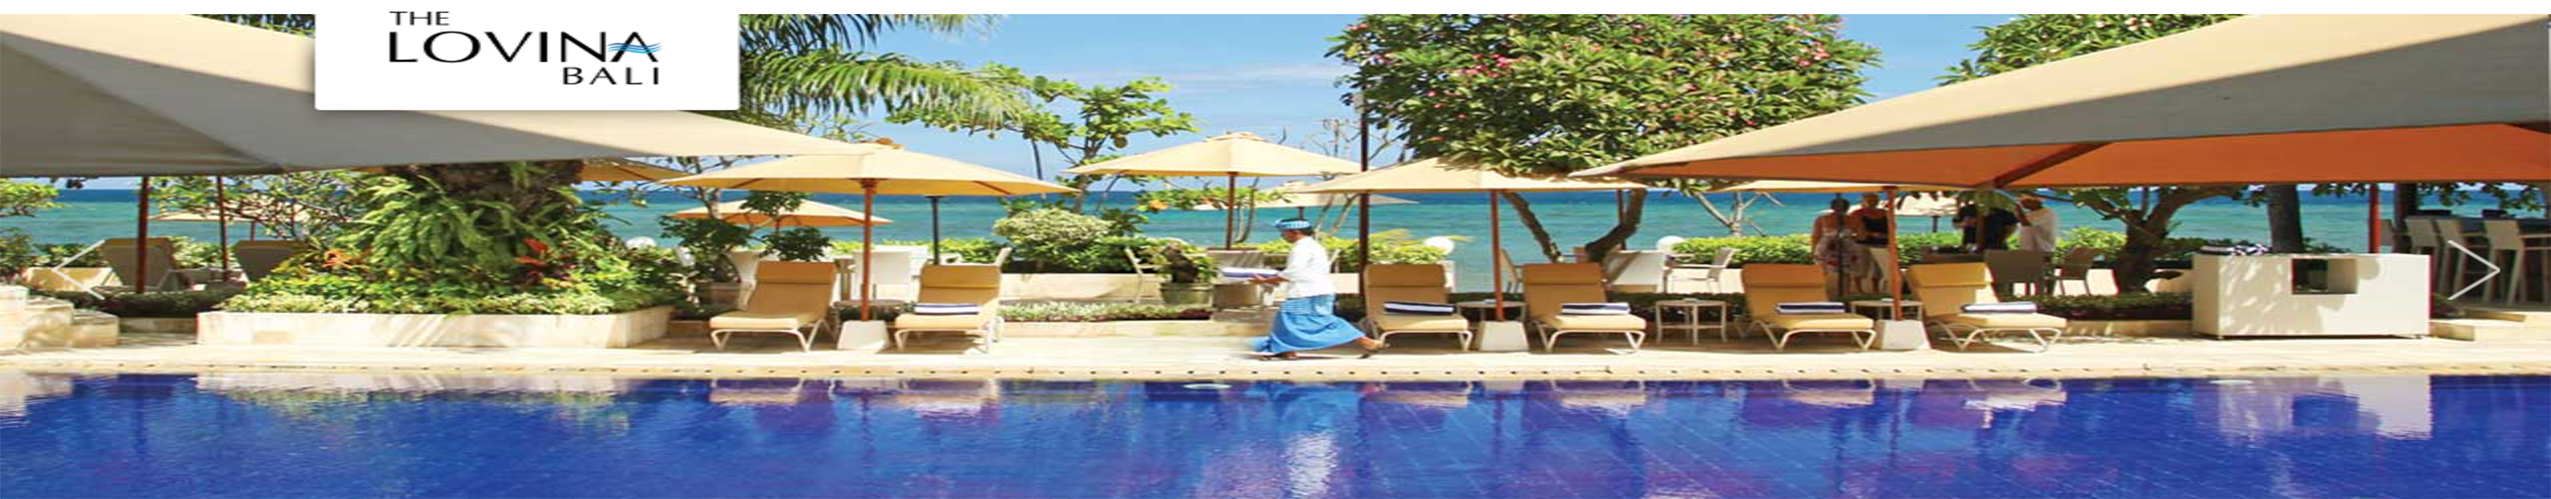 The Lovina Bali Resort